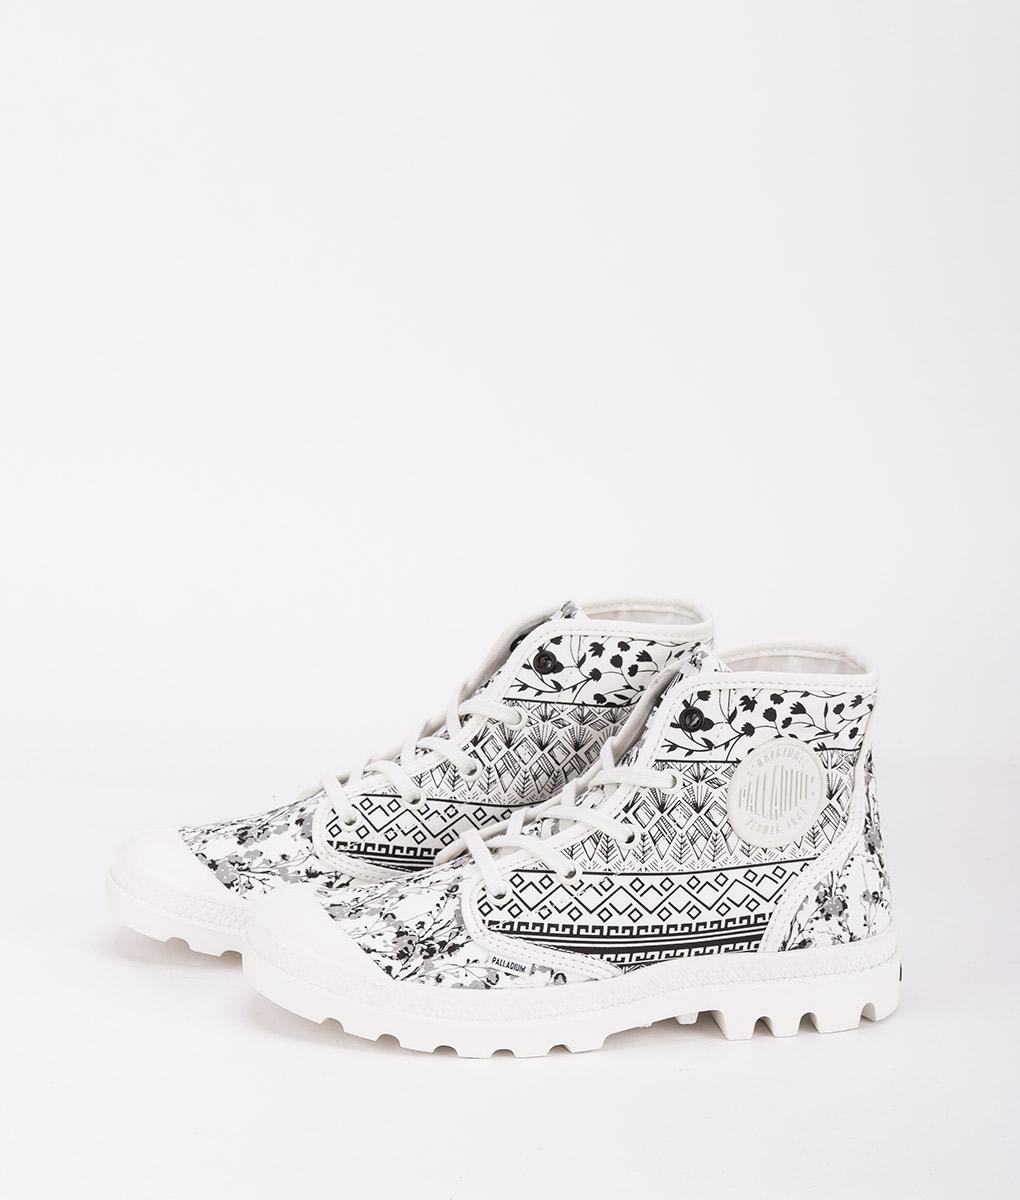 PALLADIUM Women Sneakers 95752 PAMPA HI P, Ethnic Black Starwhite 79.99